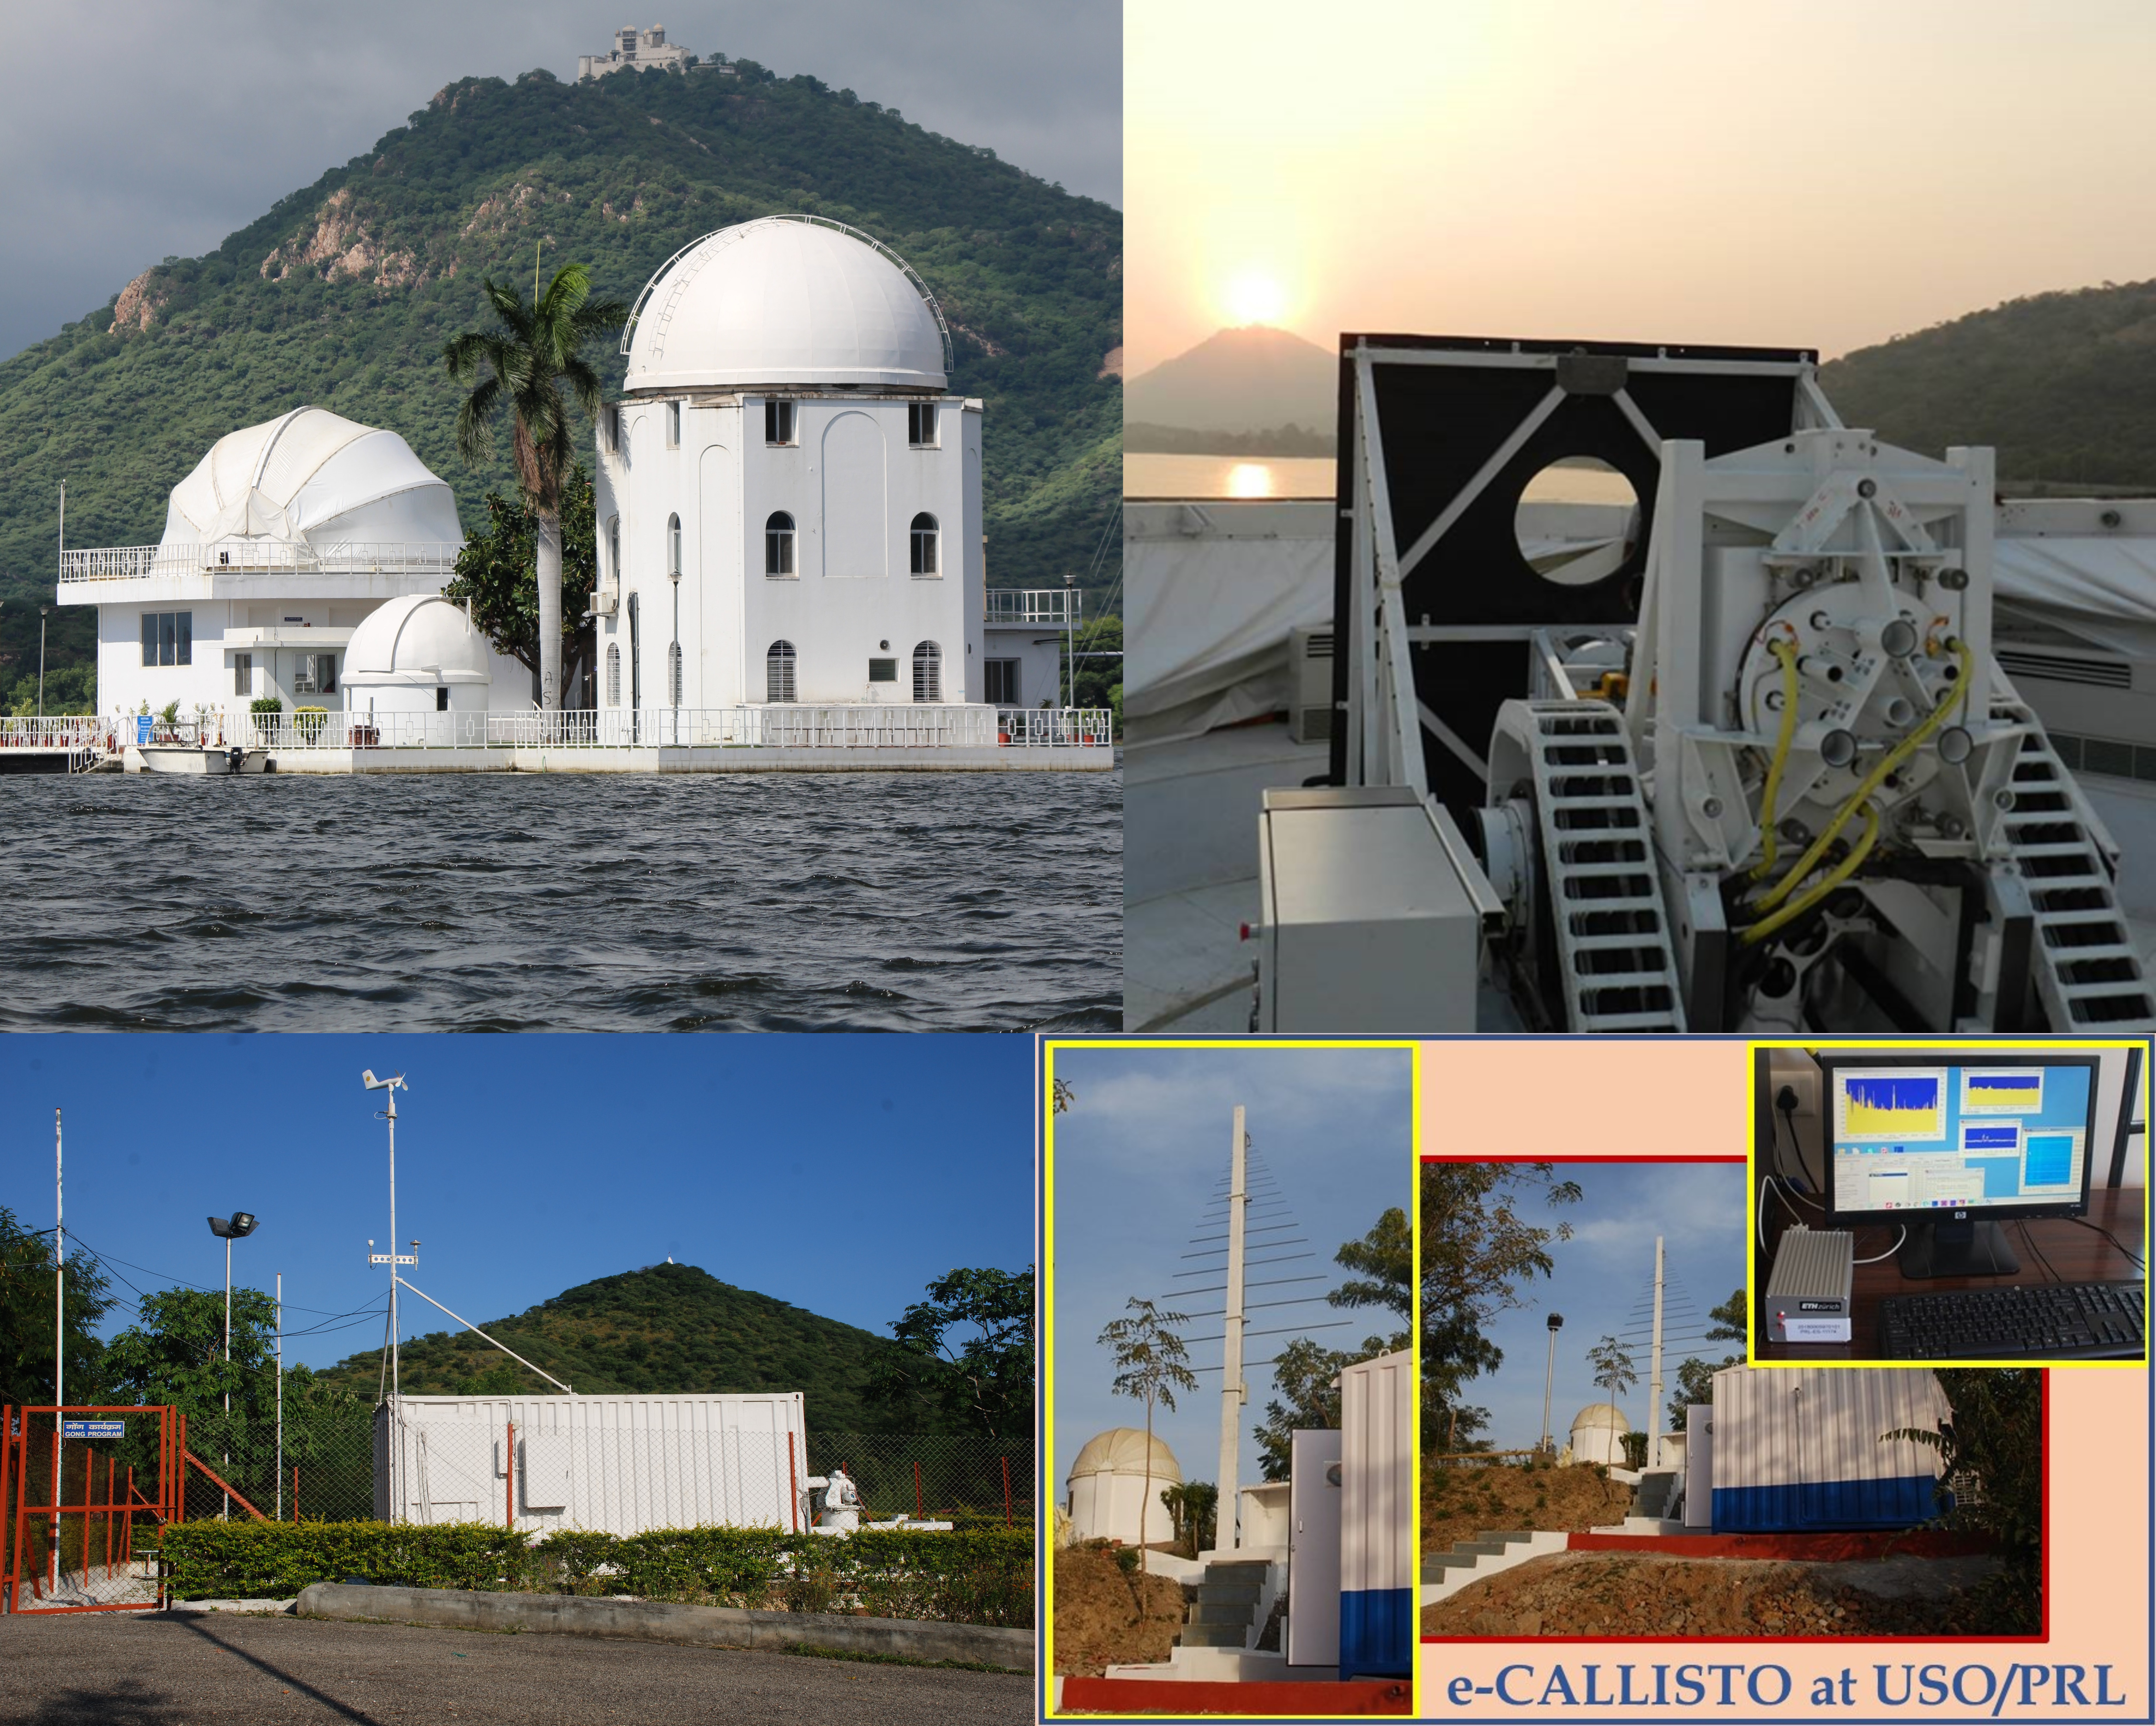 USO Observatory